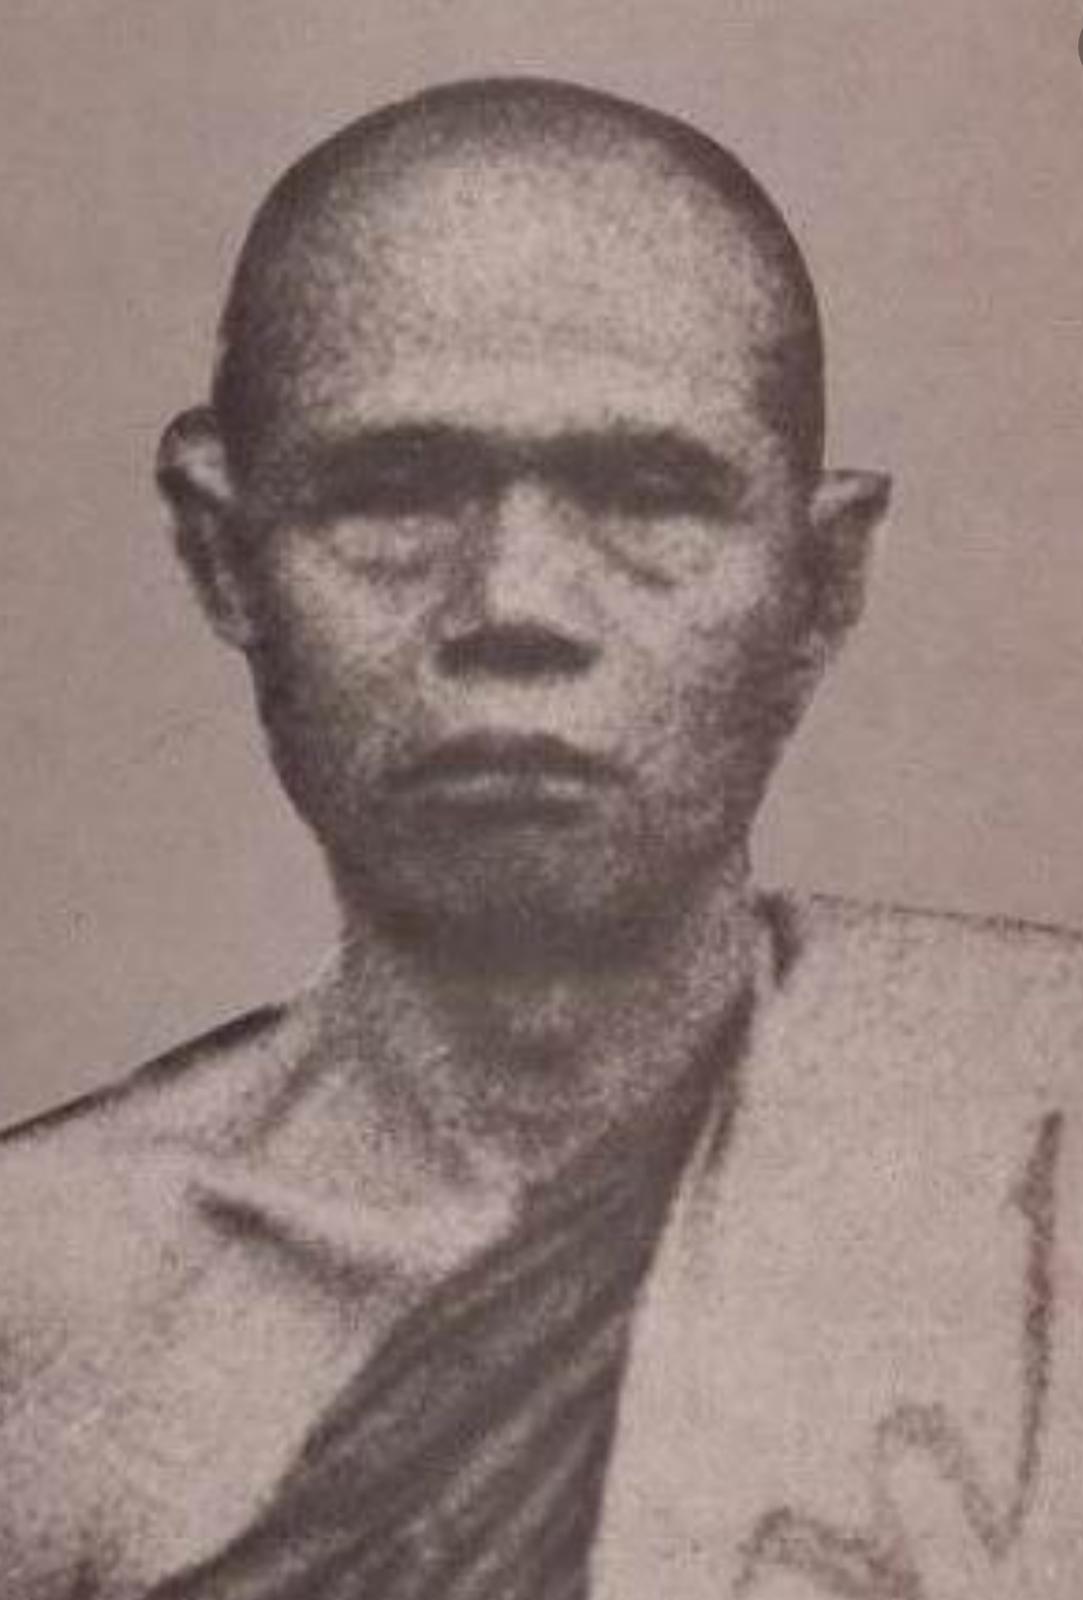 LP Chaeng Wat Bang Pang